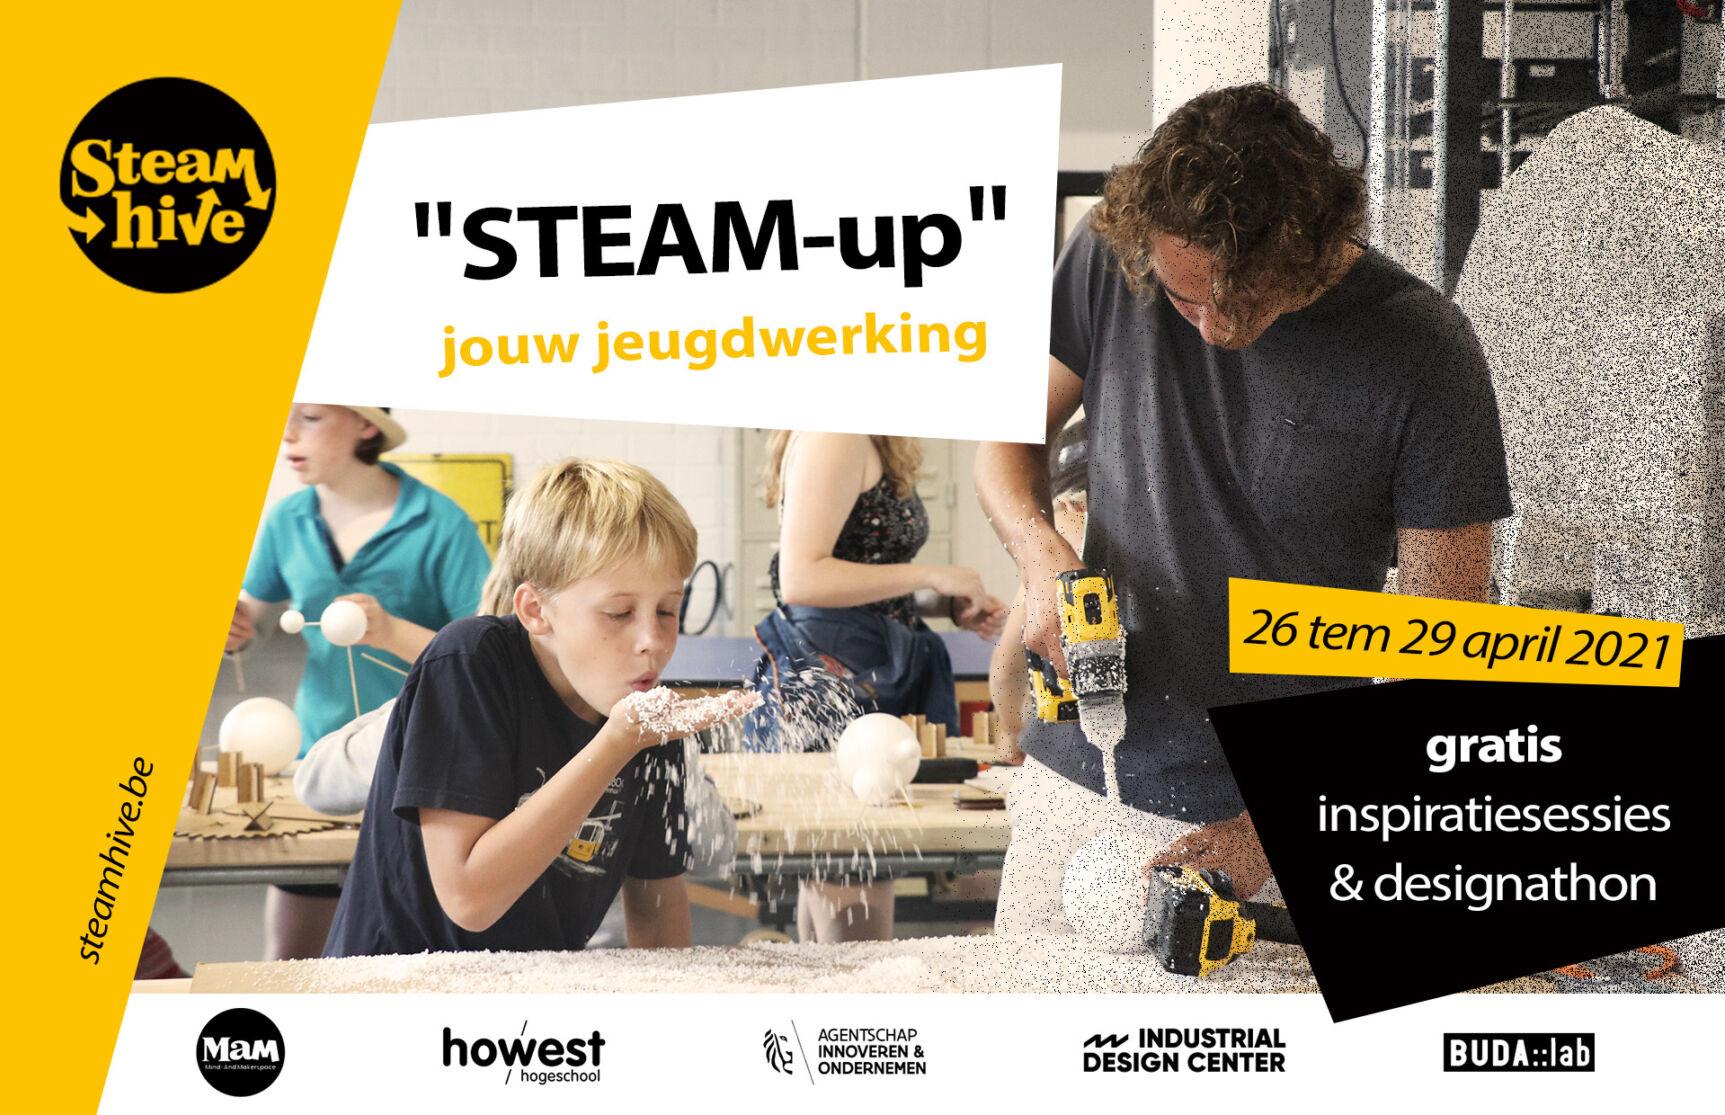 Steamhive inspiratieweek